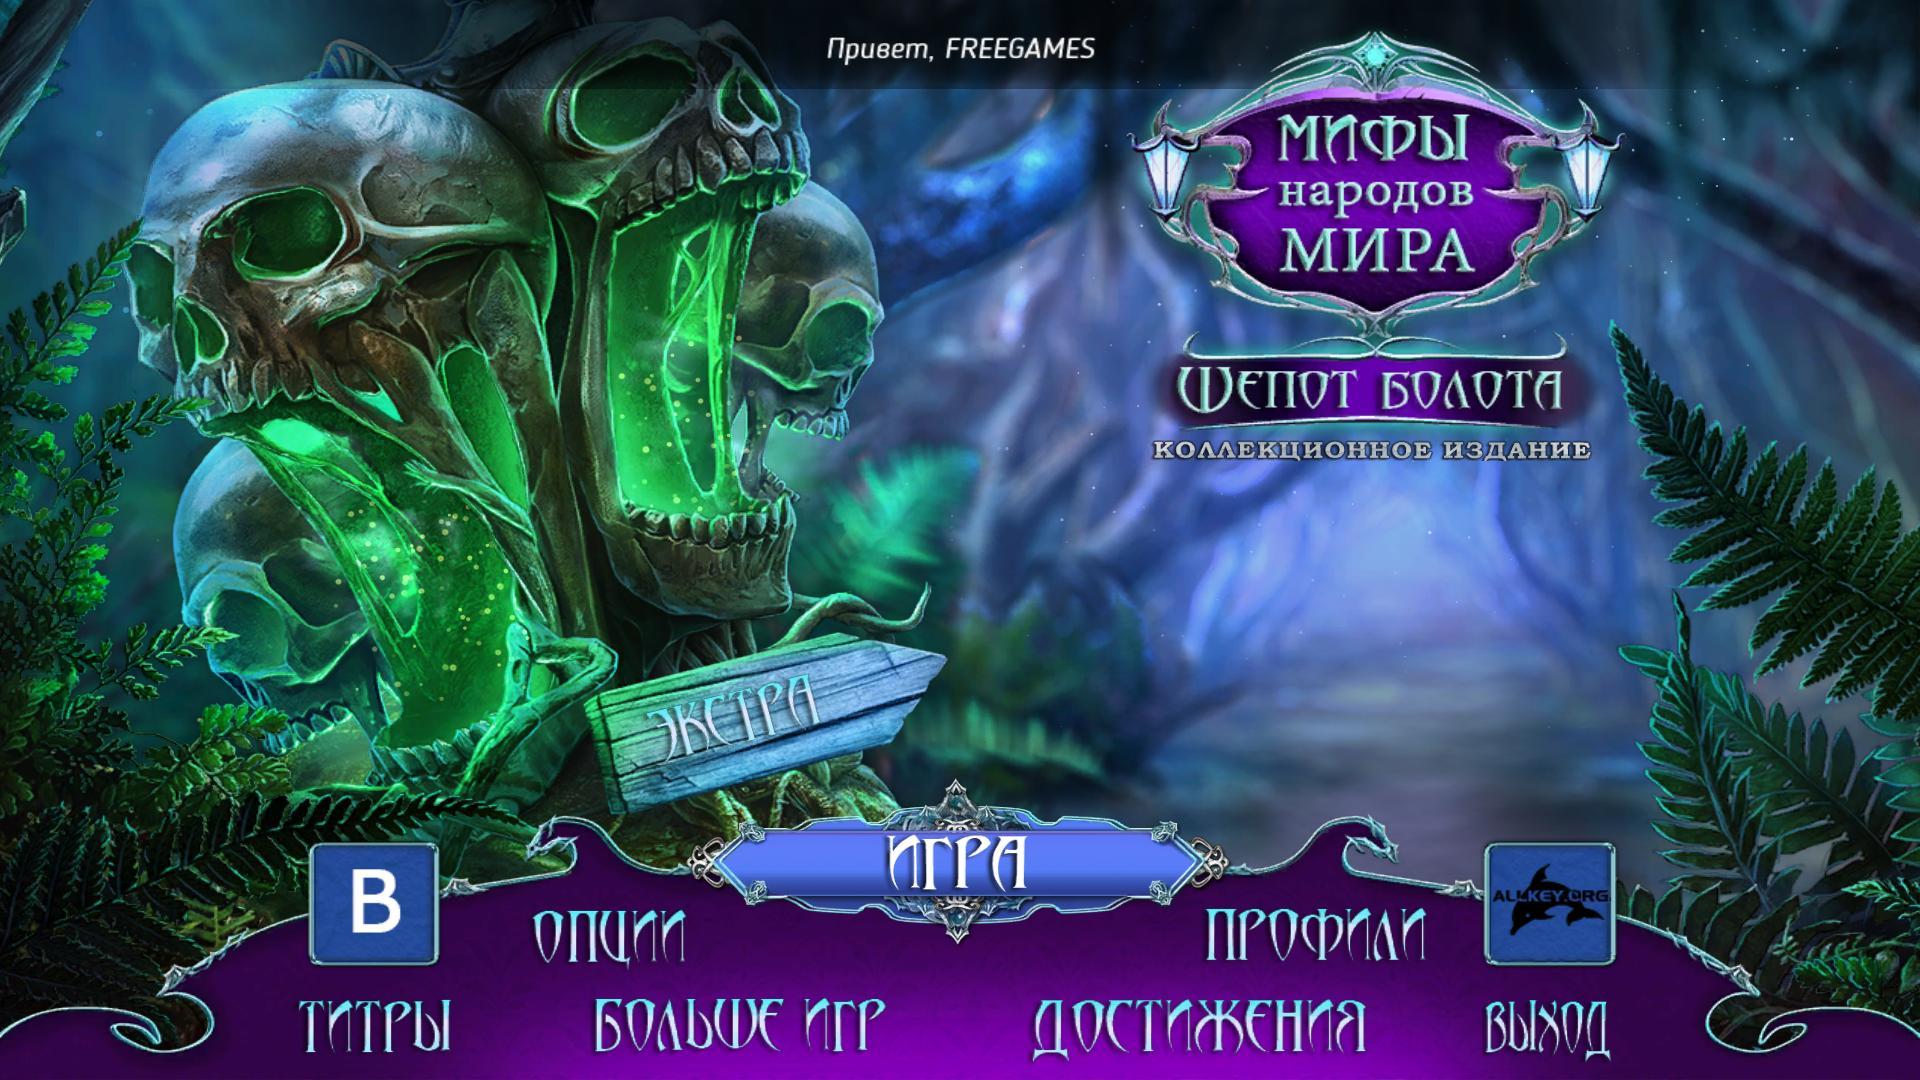 Мифы народов мира 7: Шепот болота. Коллекционное издание   Myths of the World 7: The Whispering Marsh CE (Rus)